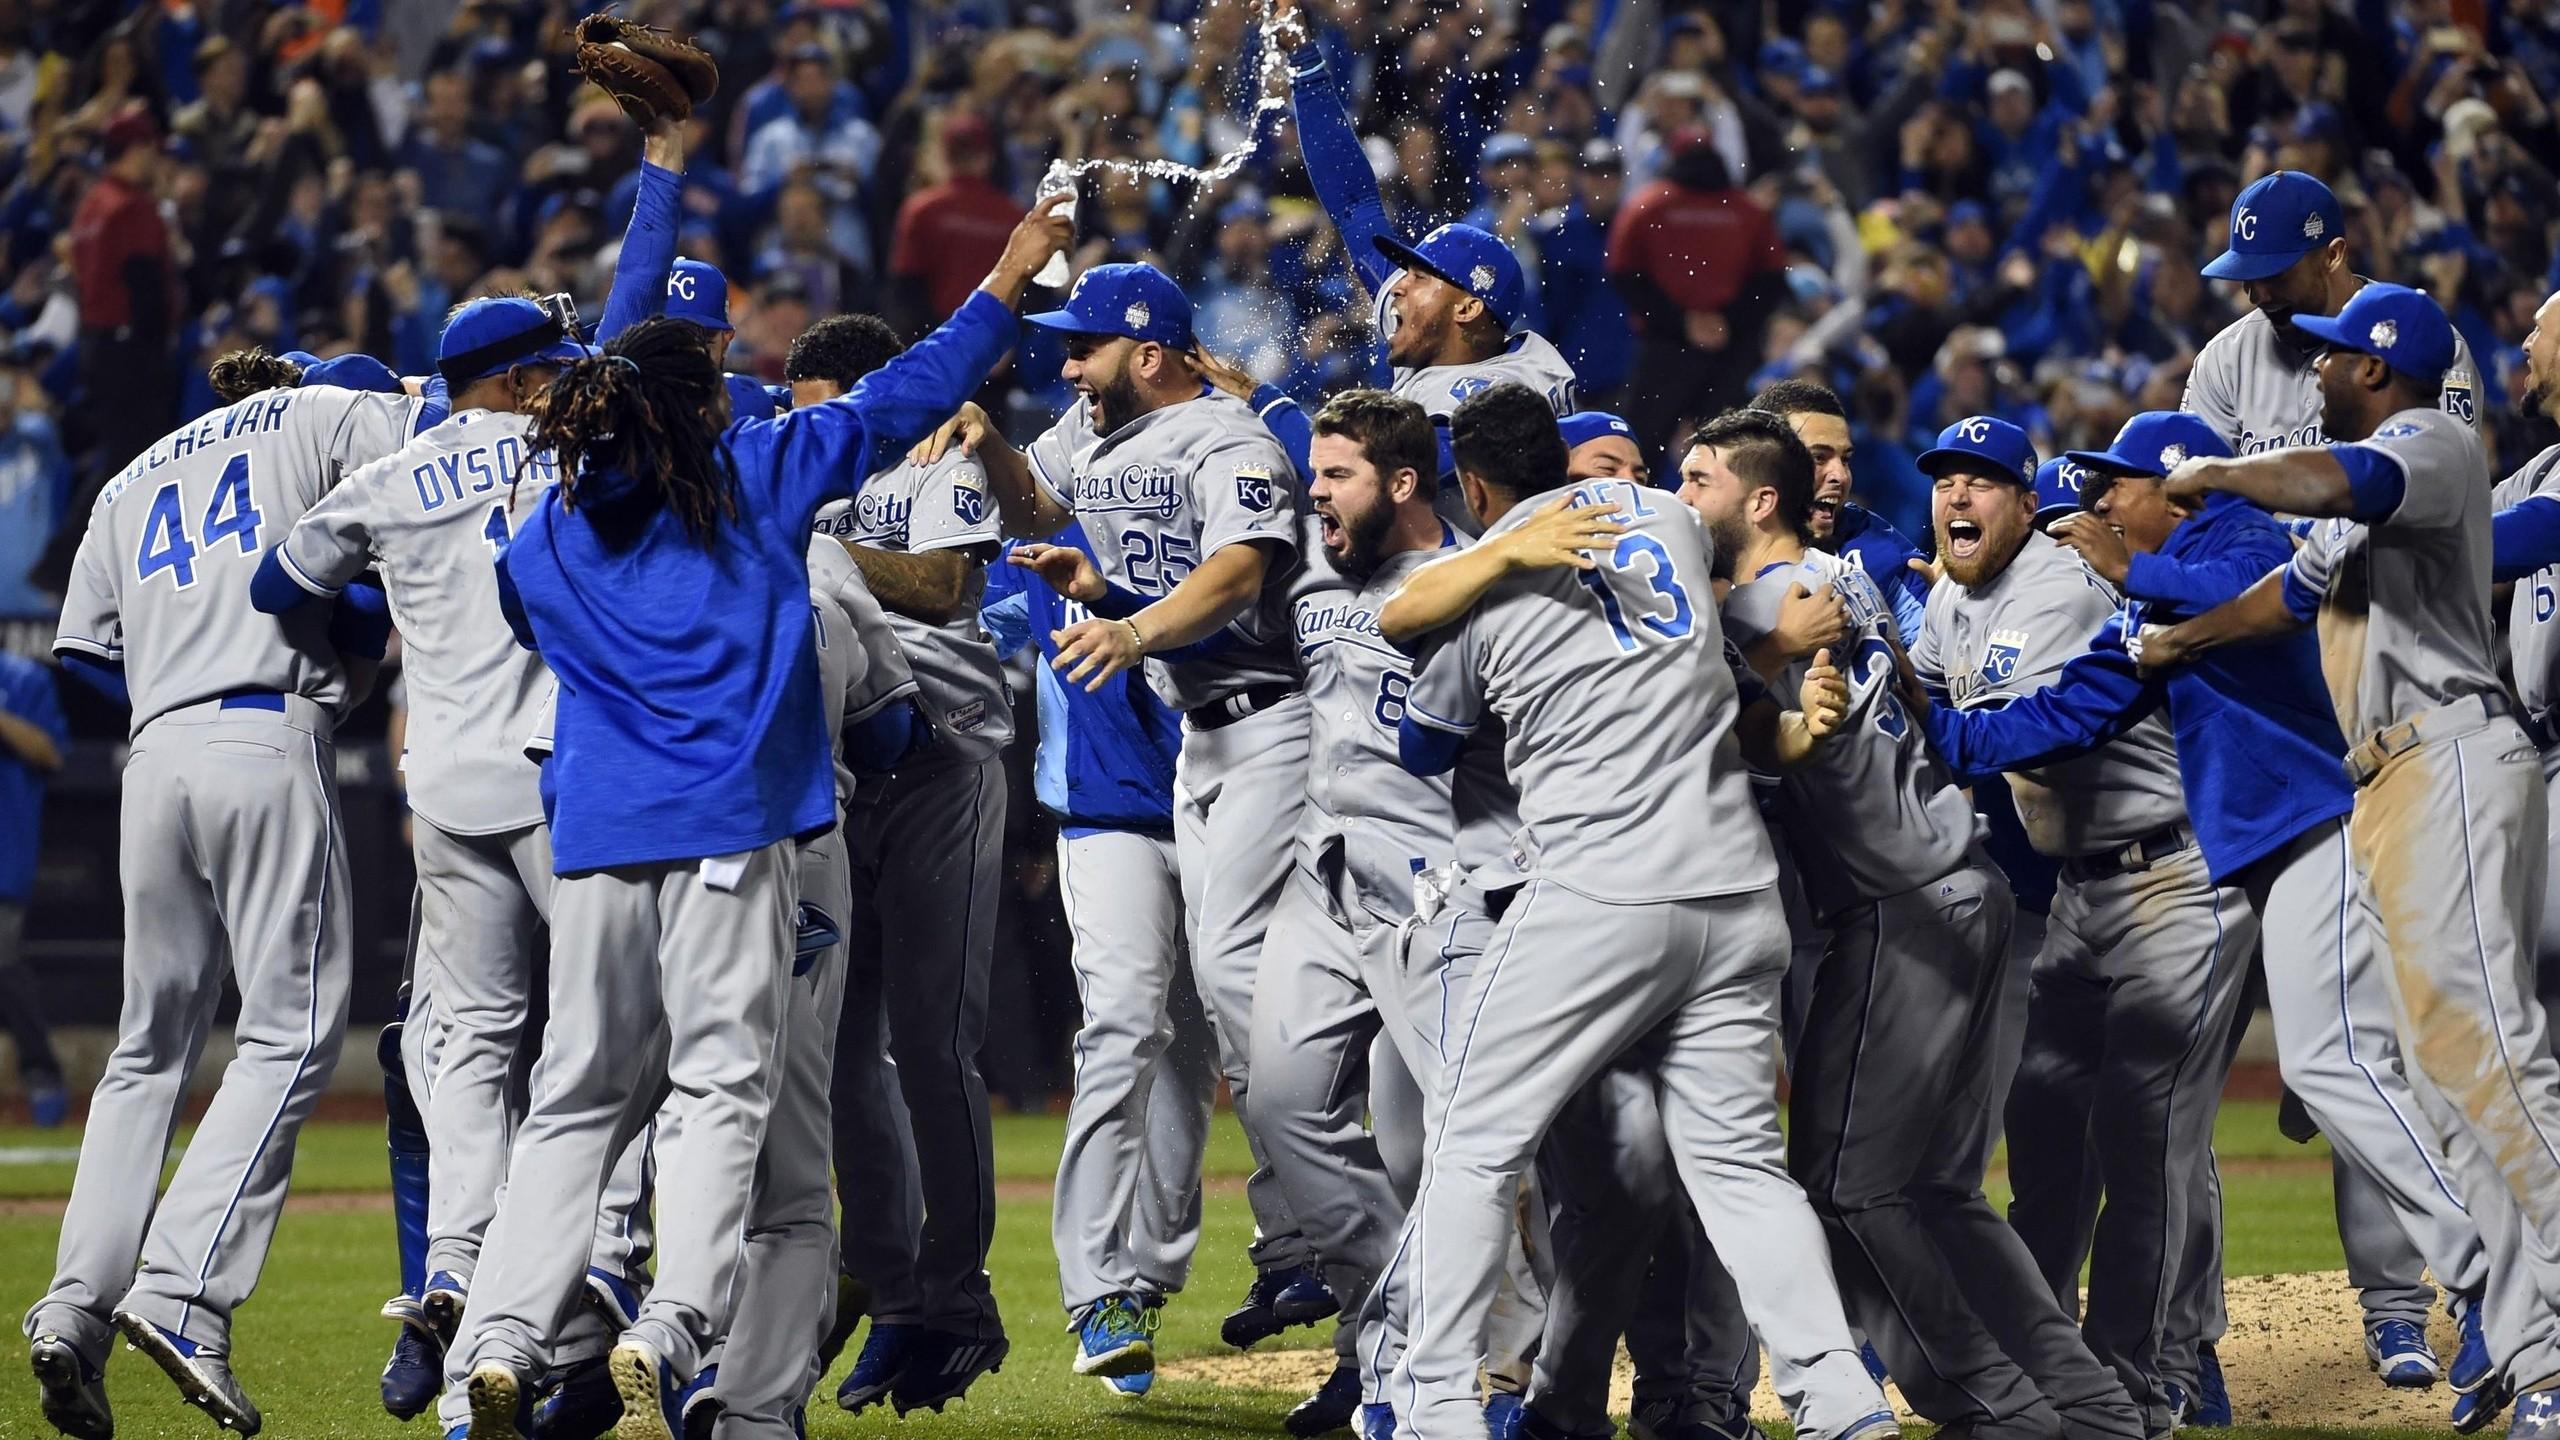 Mlb, Baseball, Kansas City Royals, Kansas City Royals Team Winners, Sports